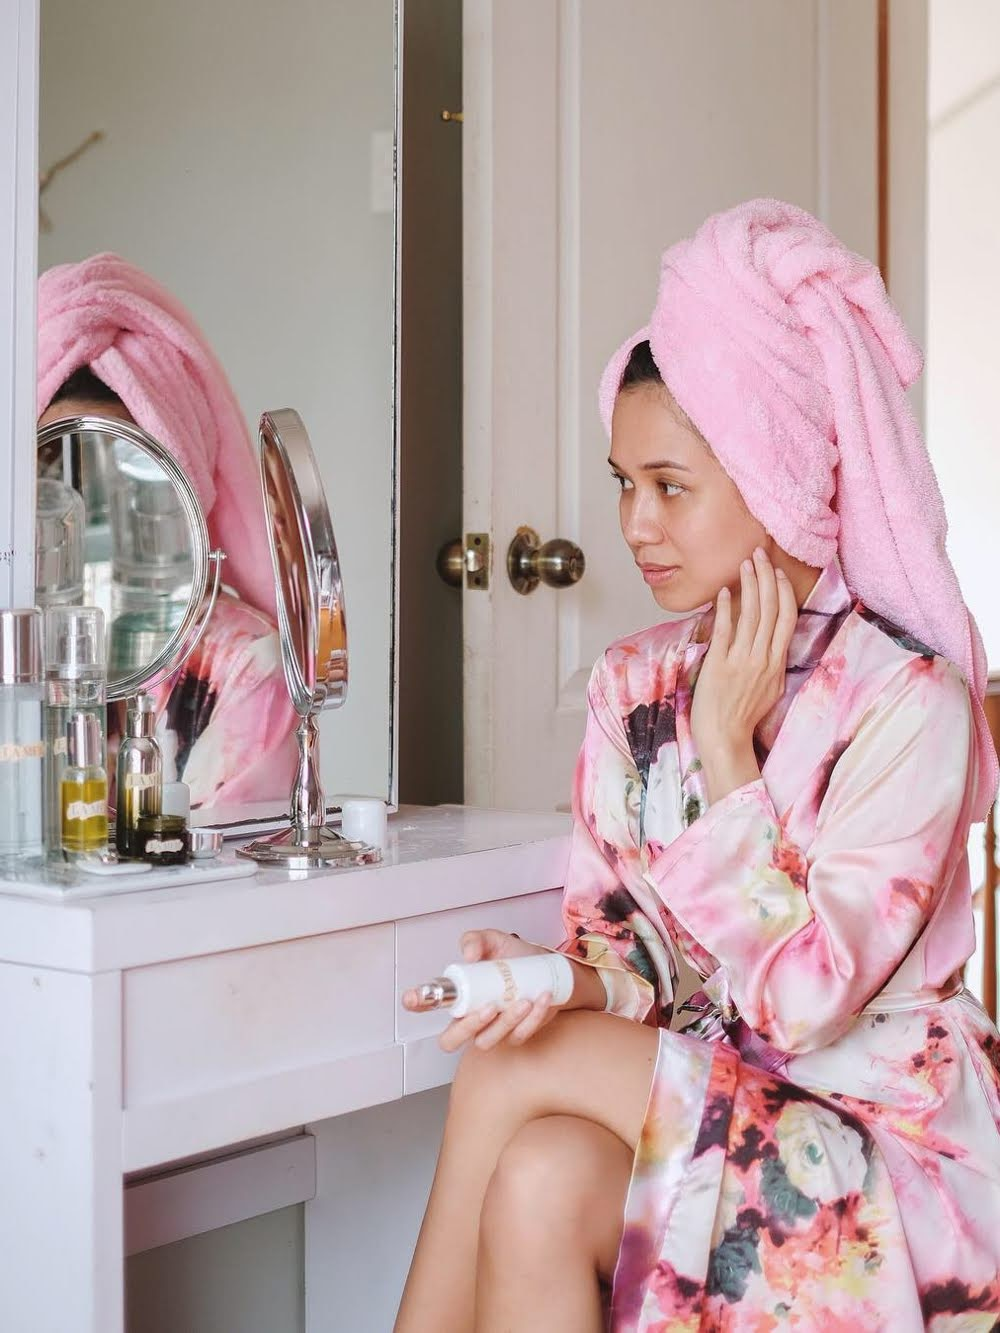 Cebu Beauty Blogger - Morning Skincare Routine - La Mer - Origins - SK-II - Cebu Mommy Blogger - Luxury Skincare - Cebu Blogger